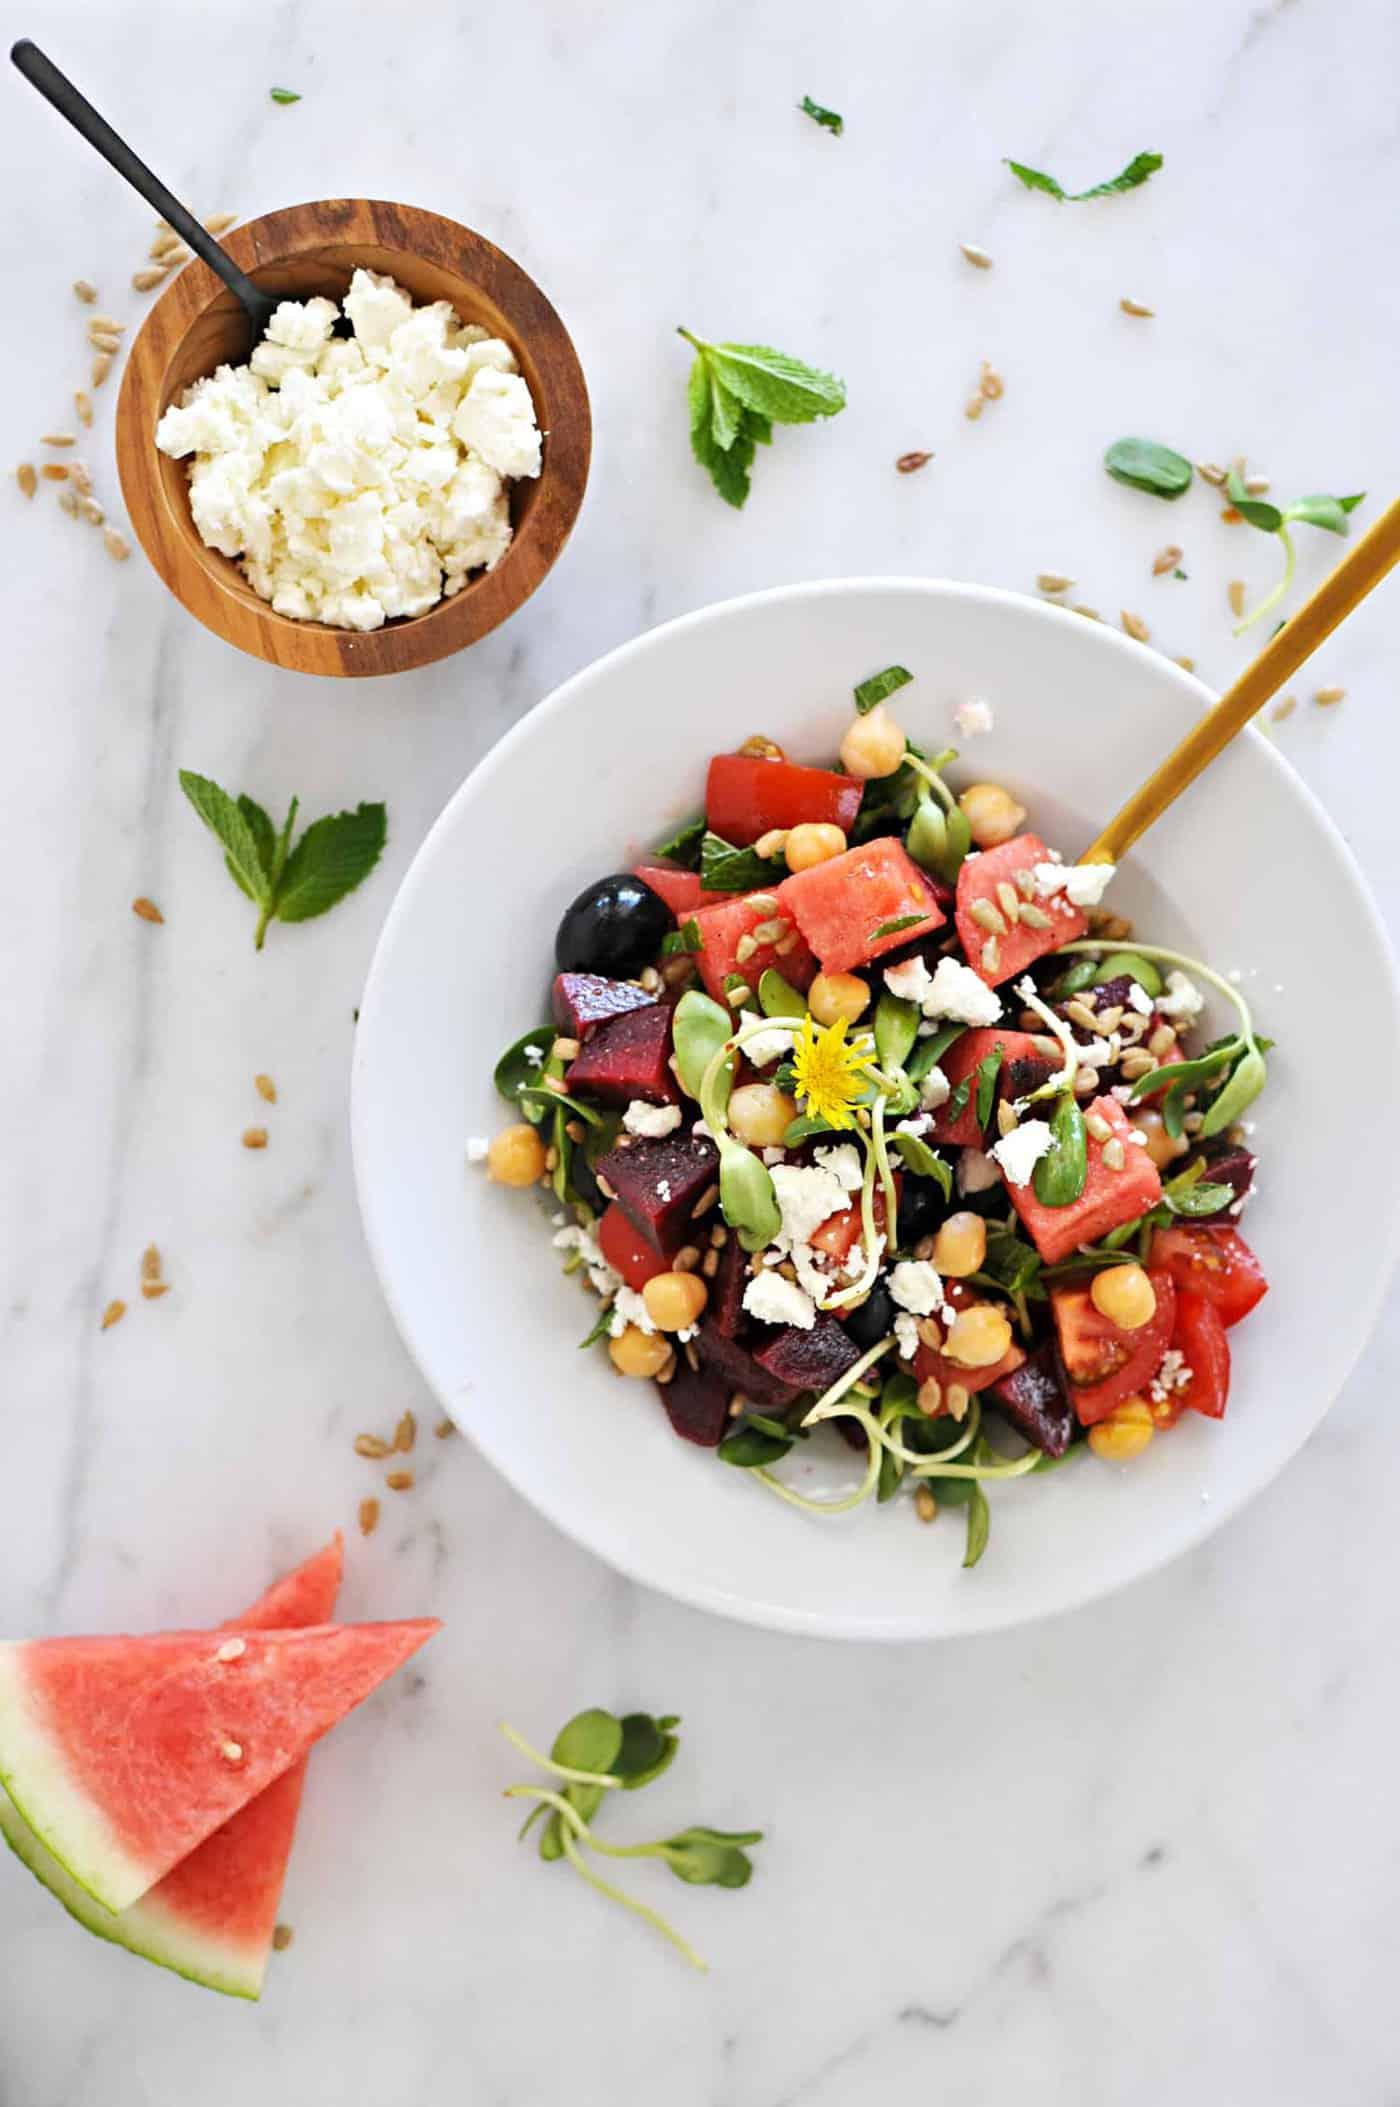 Mason Jar Greek-Style Watermelon Salads recipe (via thepigandquill.com) #vegetarian #glutenfree #lunch